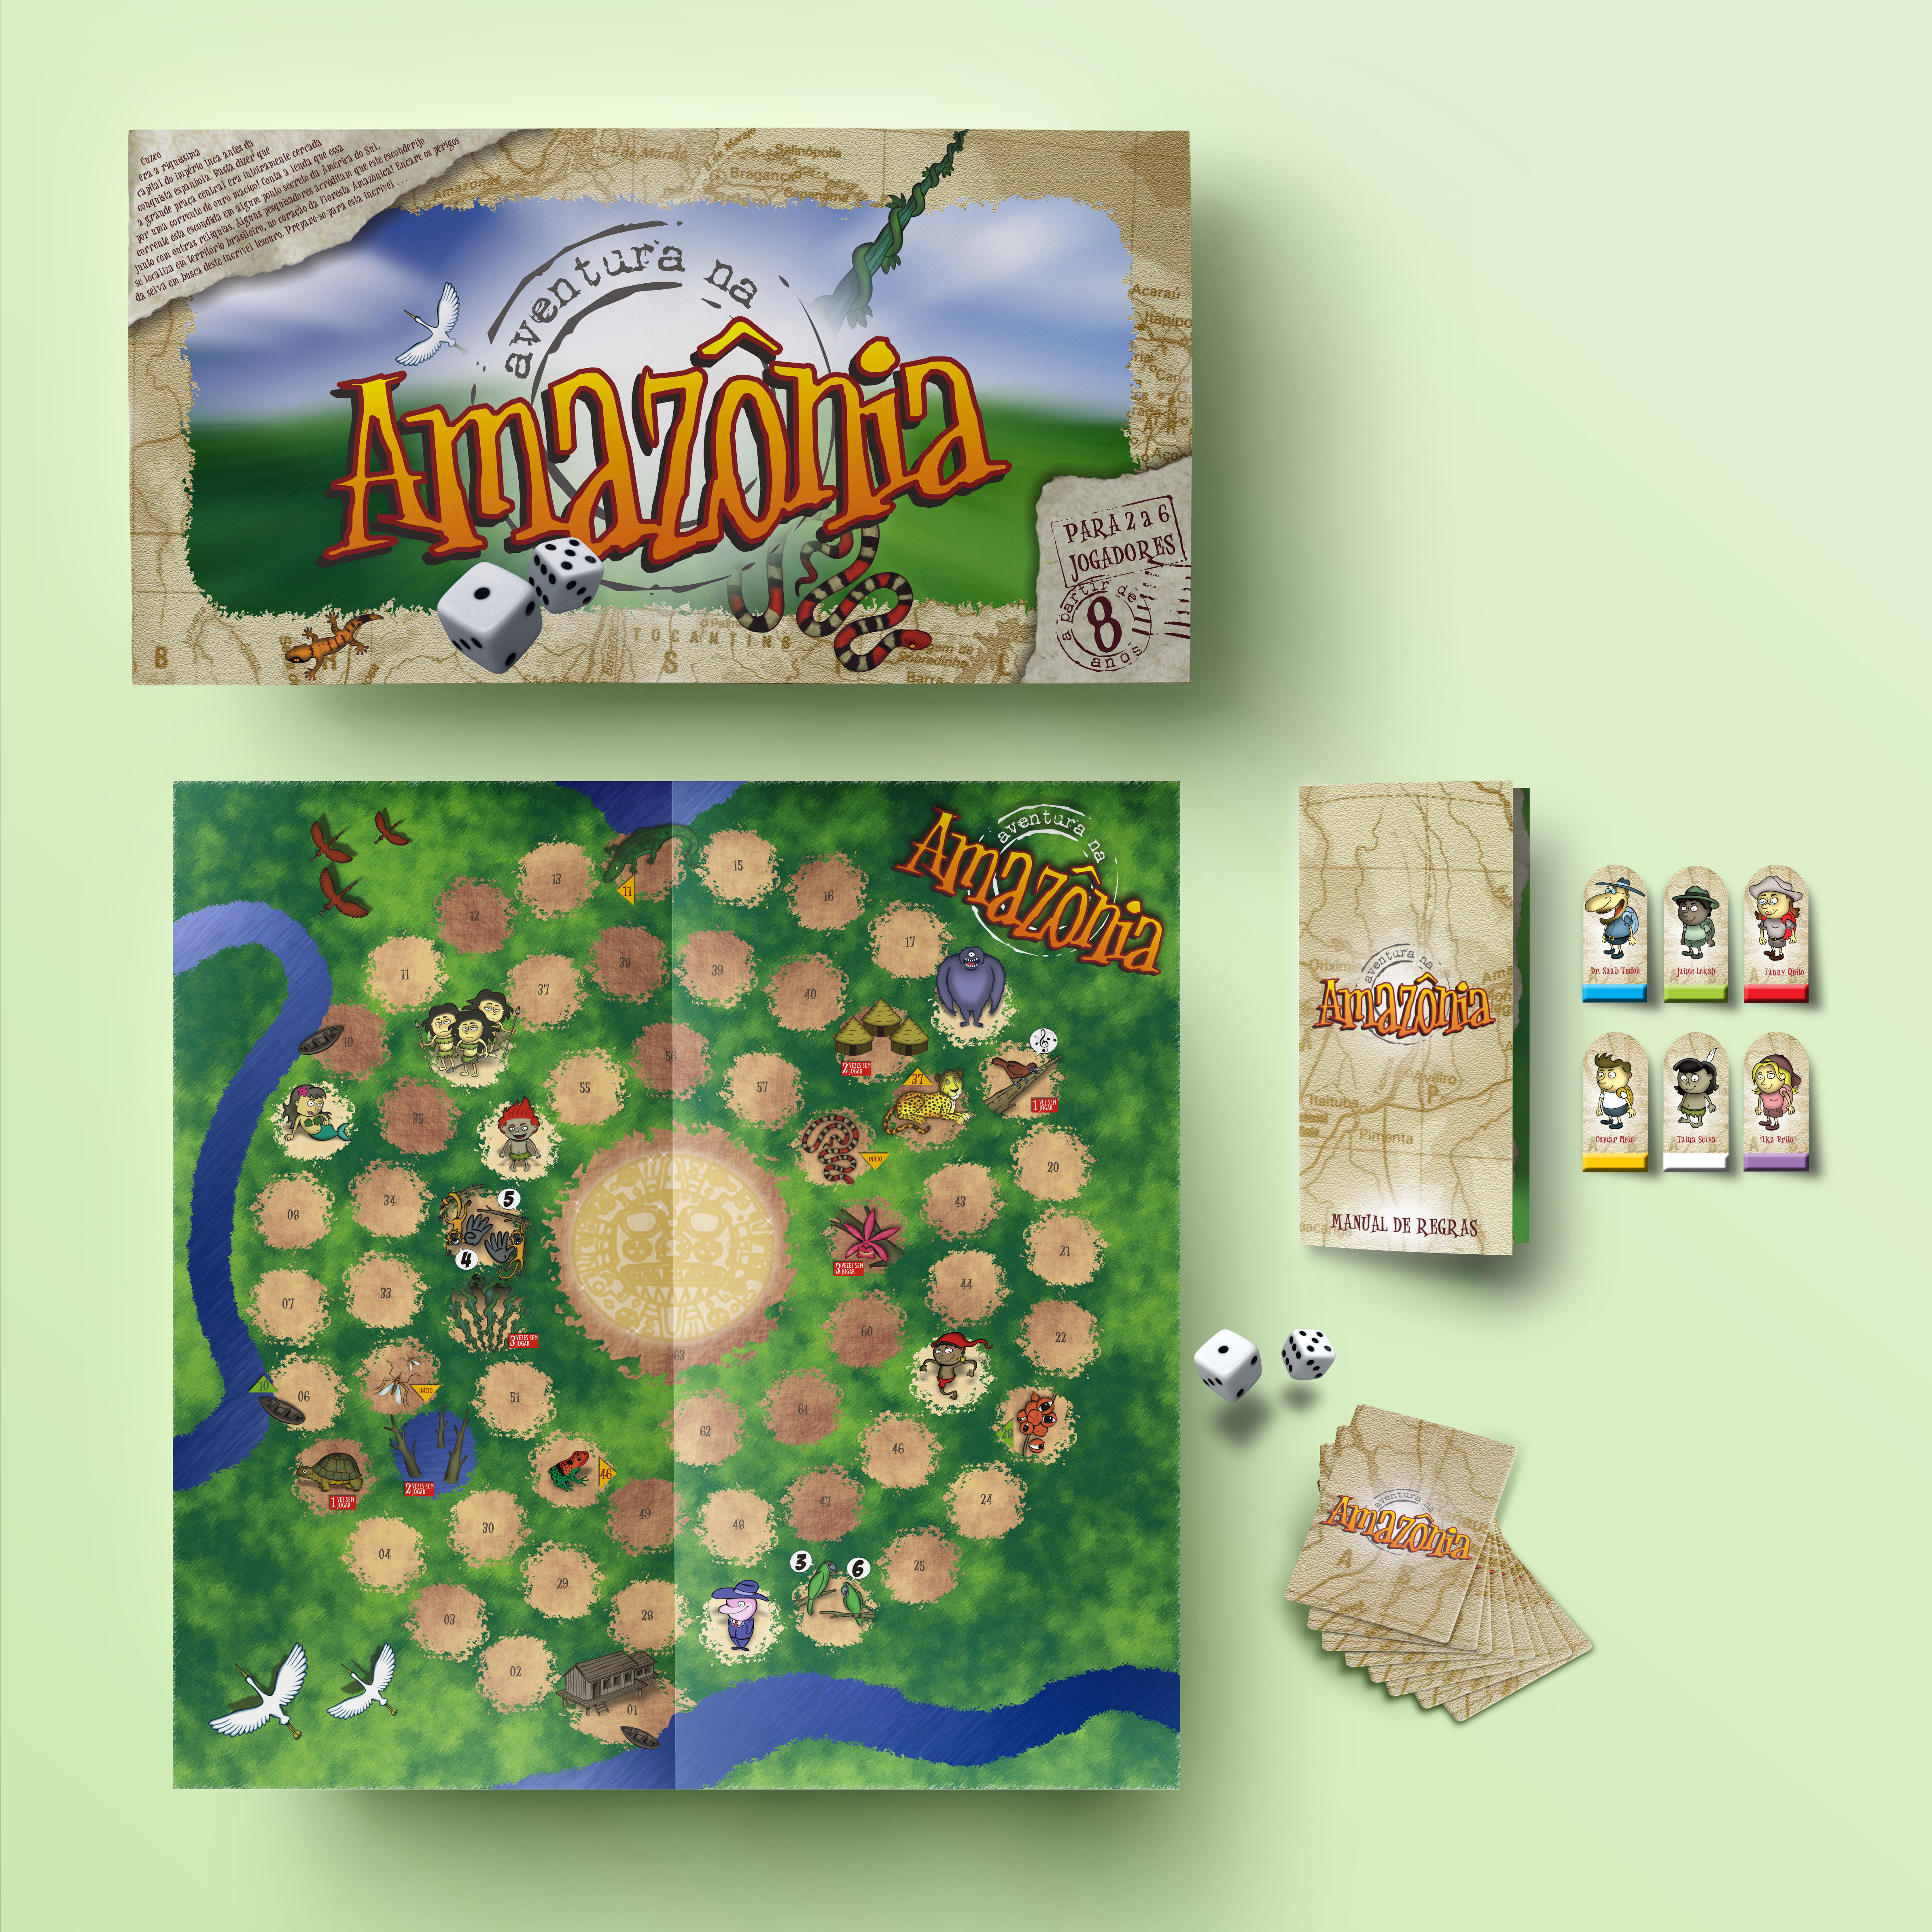 aventura-amazonia-apresentacao-01b